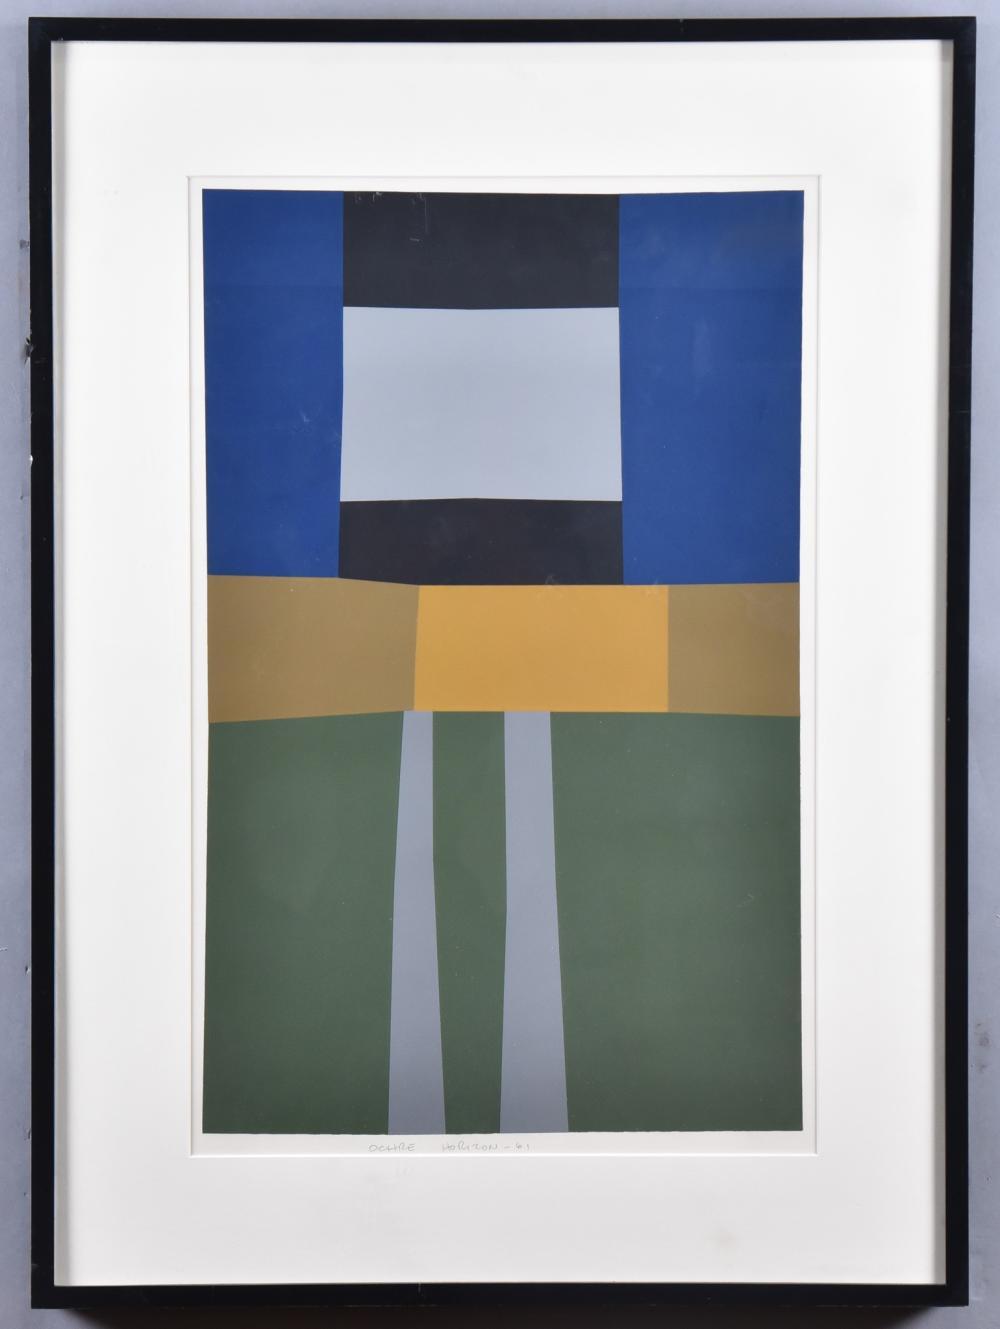 Harold Krisel, New York (1920-1995), Ochre Horizon, 1961, serigraph, 21 x 13 1/4 inches